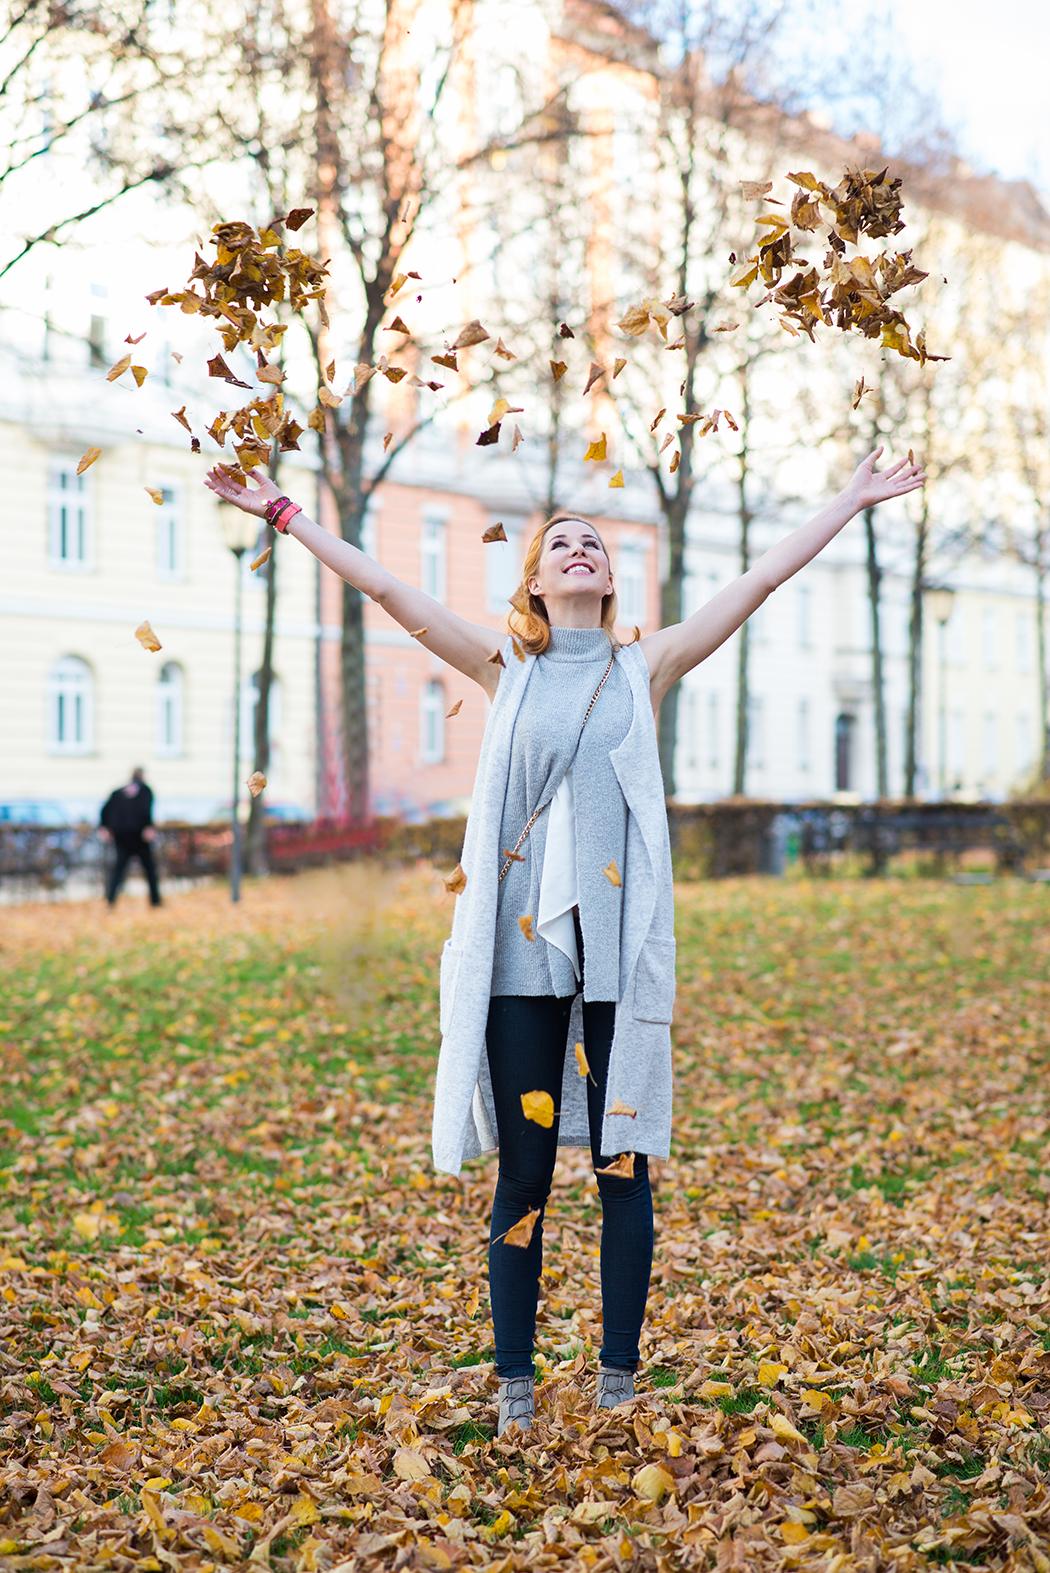 Fashionblog-Fashionblogger-Fashion-Blog-Blogger-München-Deutschland-Lindarella-Beliya-Sorel-Bag-7-web